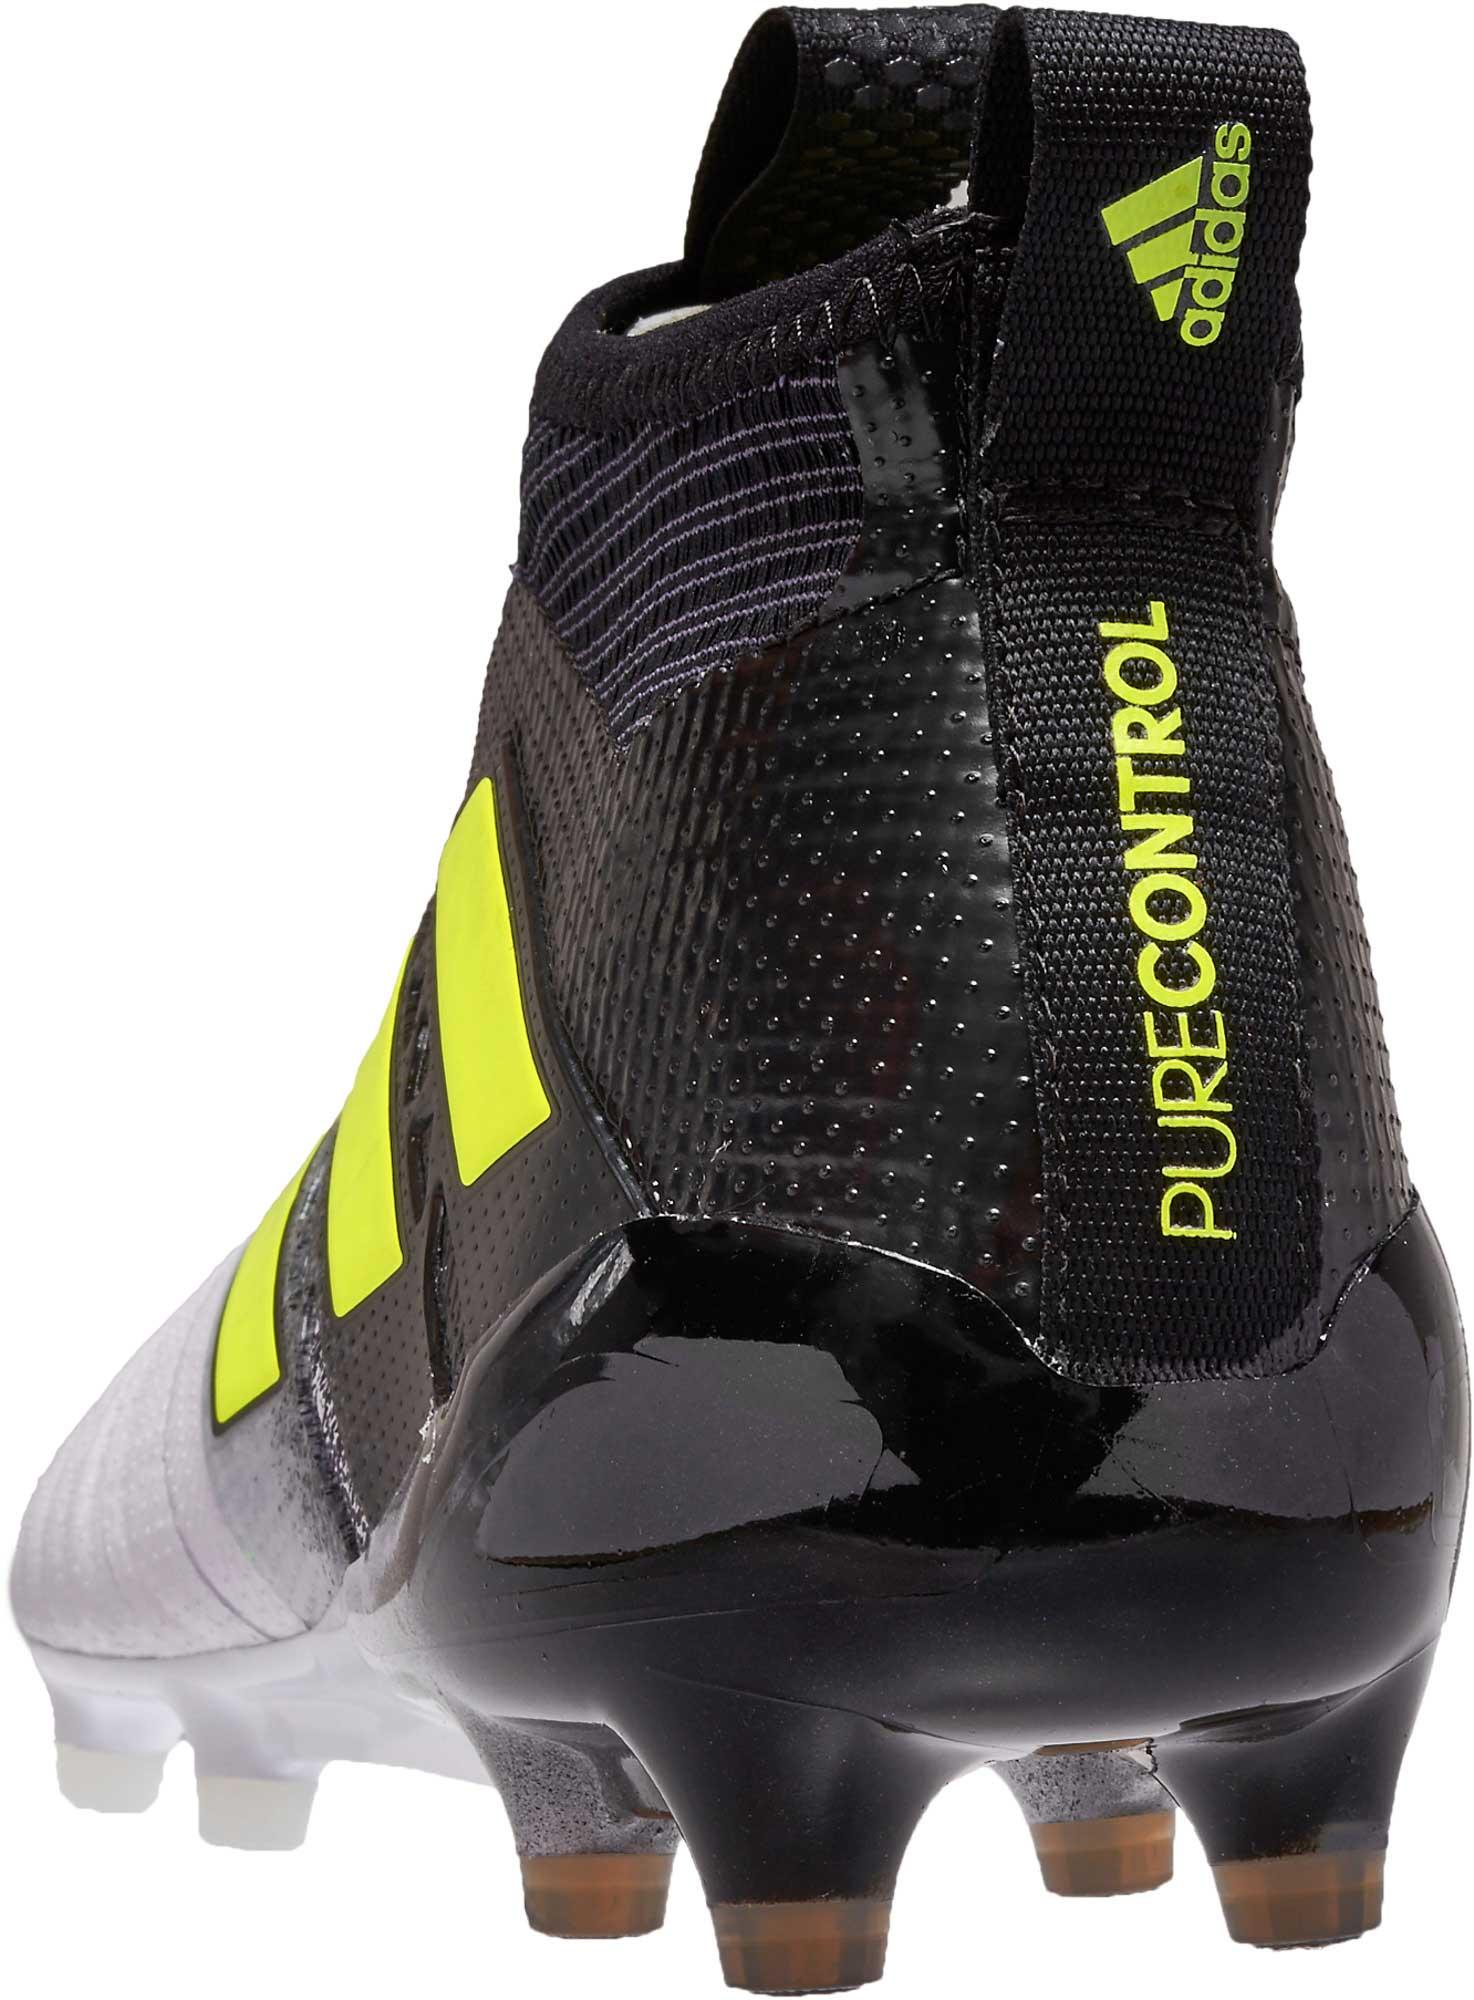 adidas ACE 17+ Purecontrol FG - White   Solar Yellow - Soccer Master f67f43f047ab8